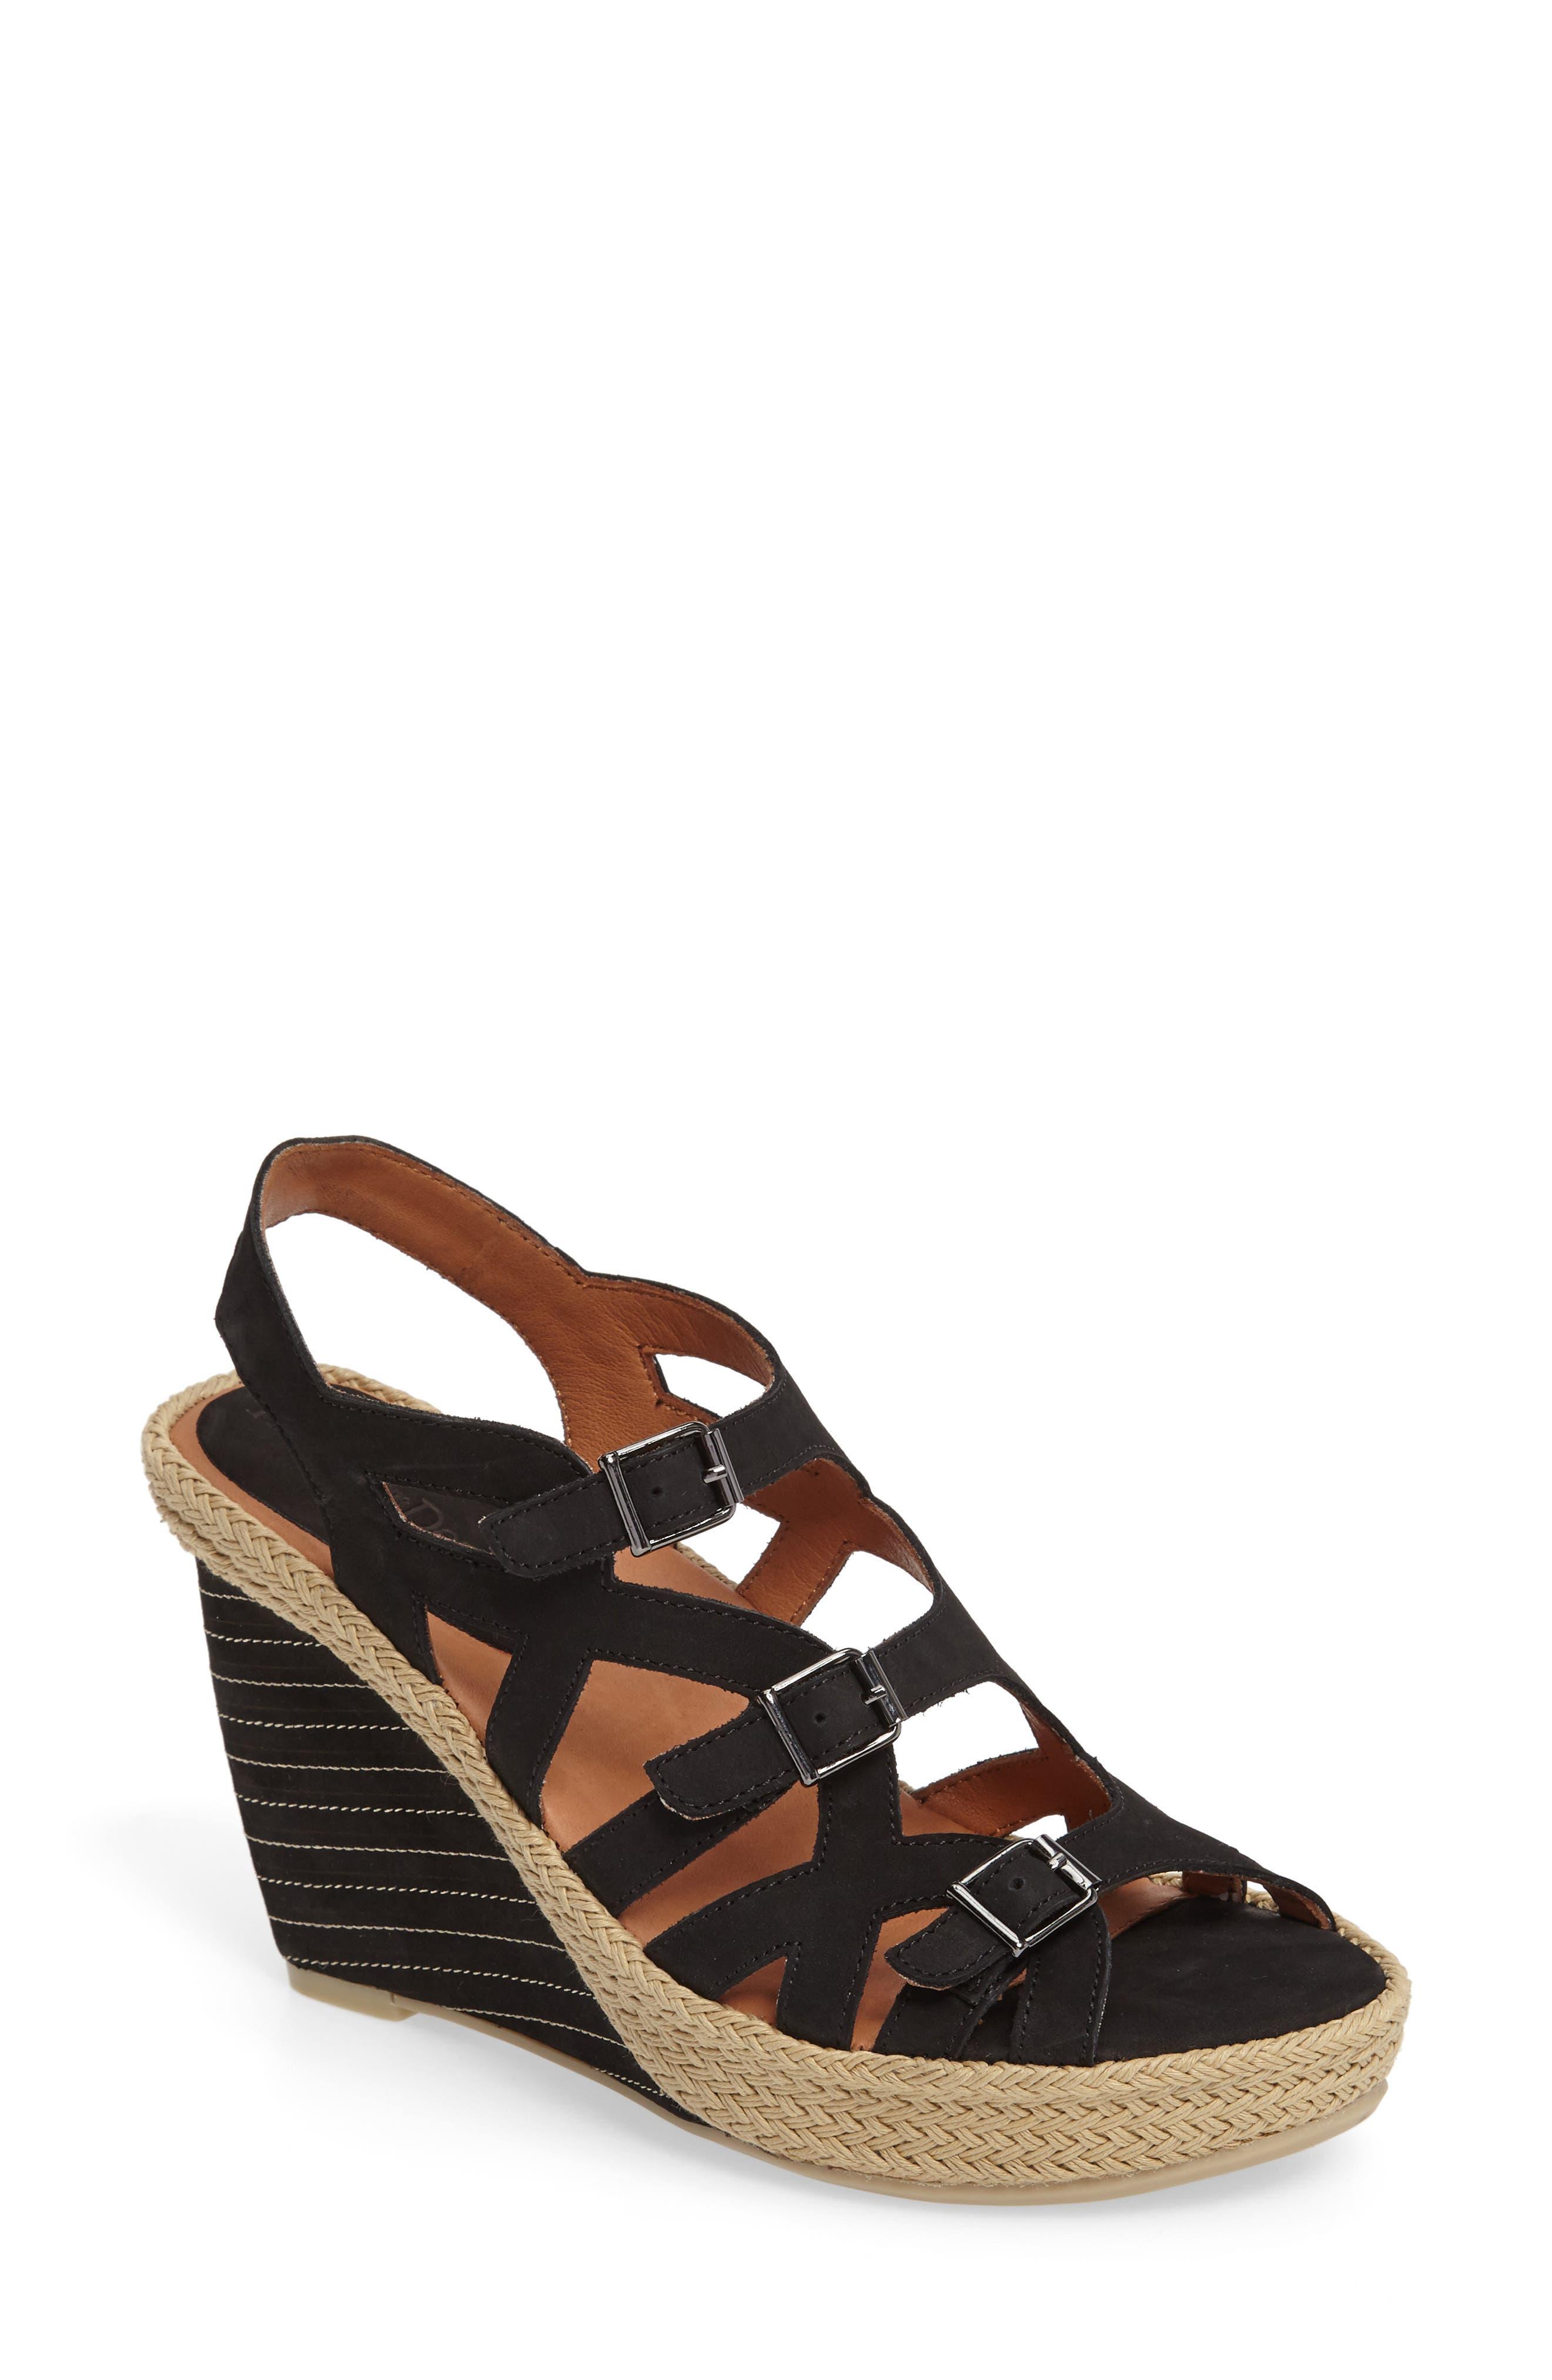 Ignacia Wedge Sandal,                         Main,                         color, BLACK NUBUCK